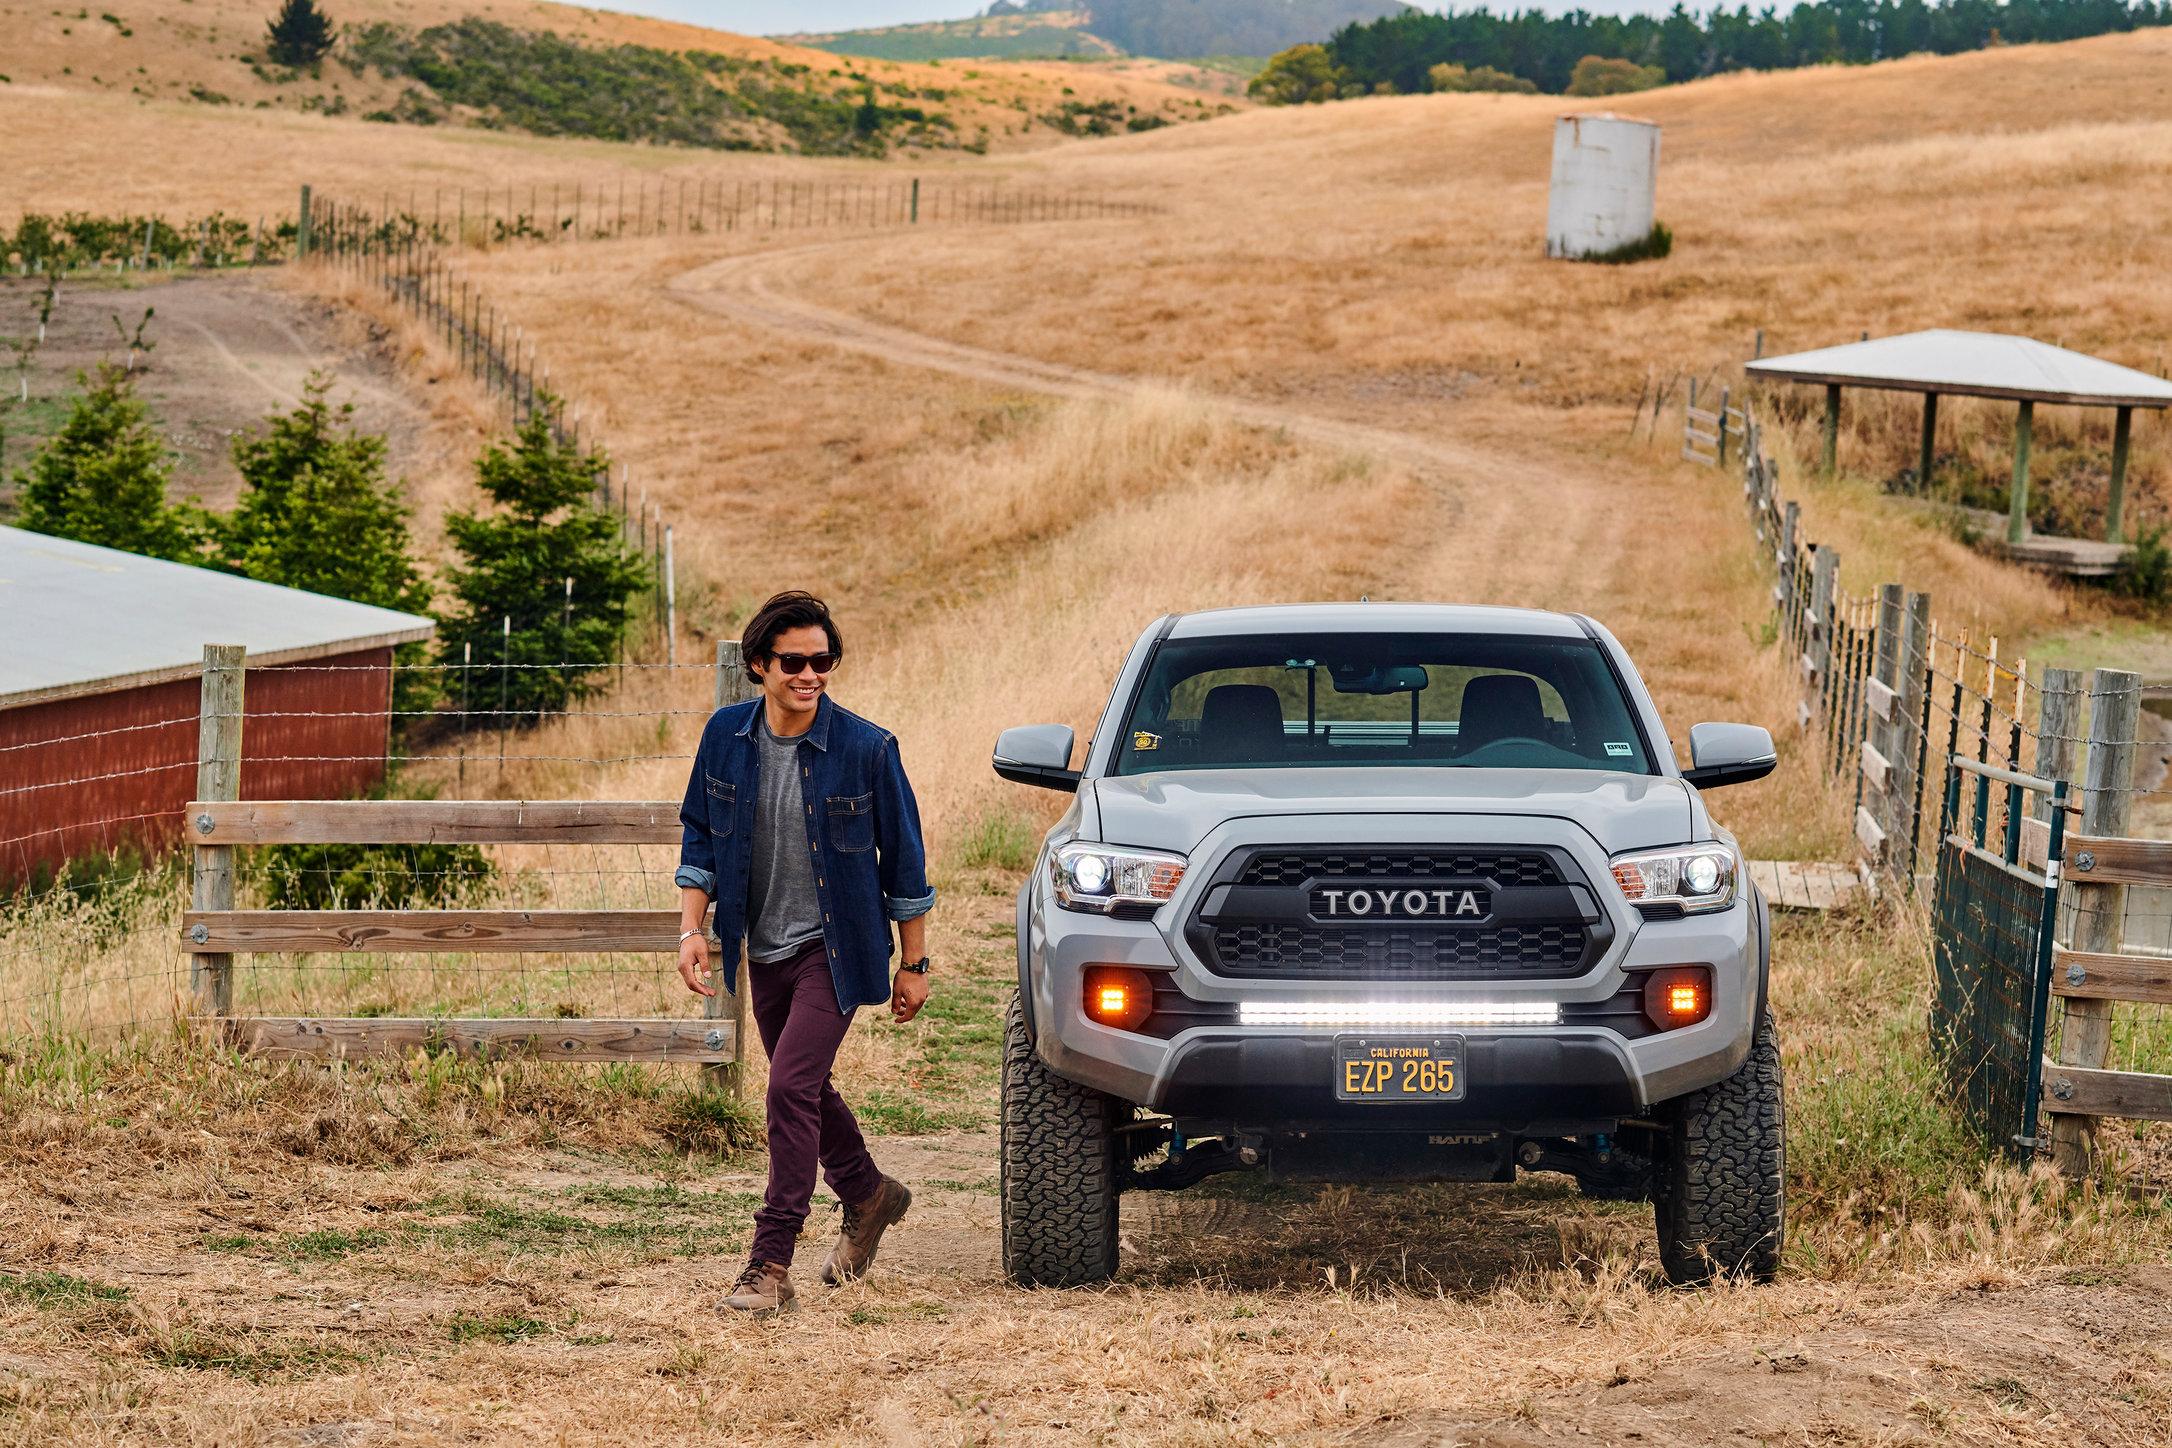 Motors_Toyota_Tacoma_Portrait_1087.jpg